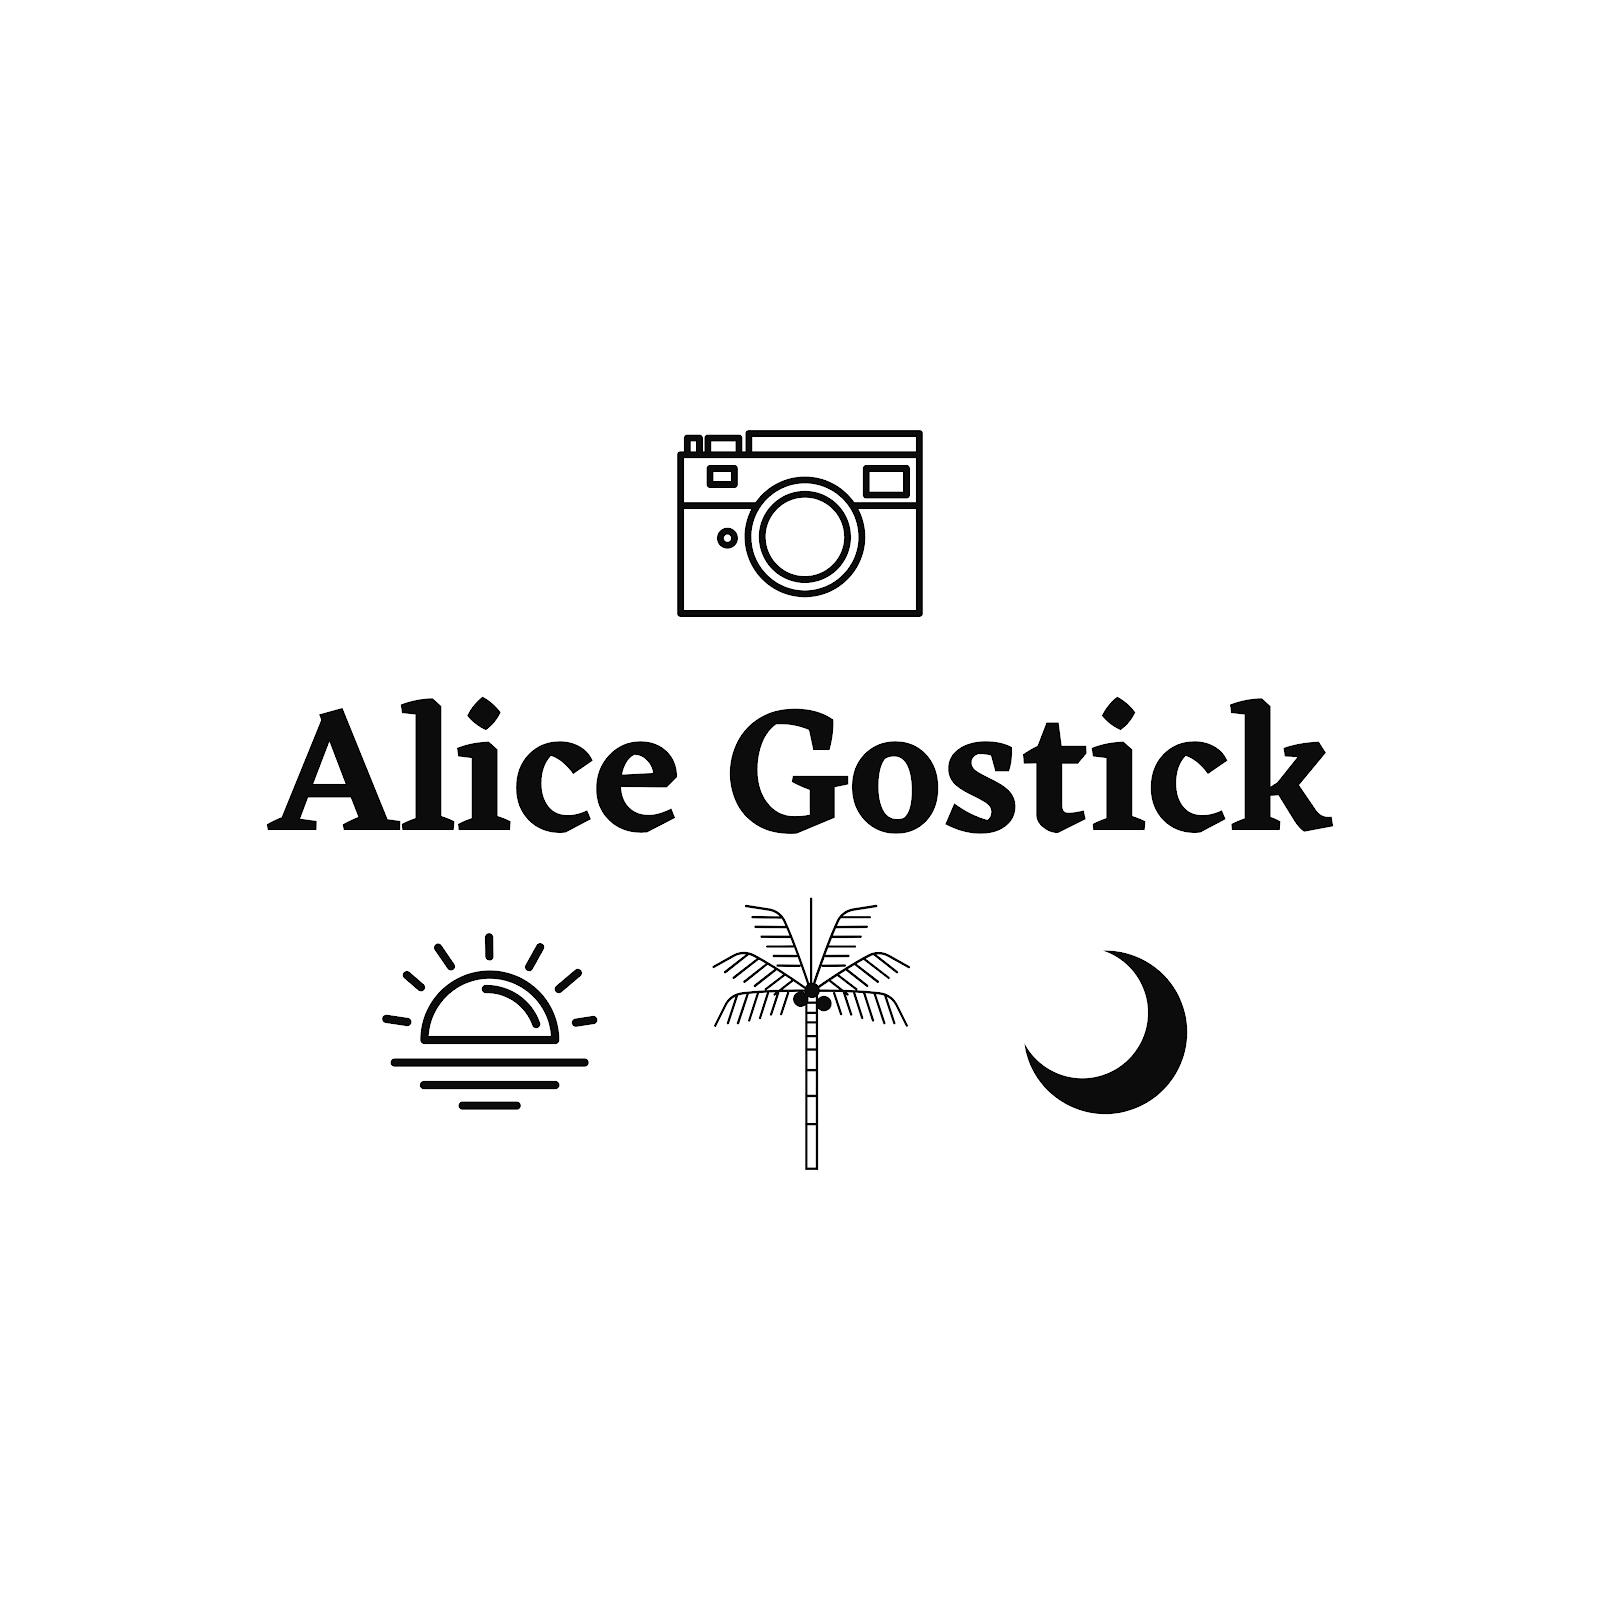 Alice Gostick